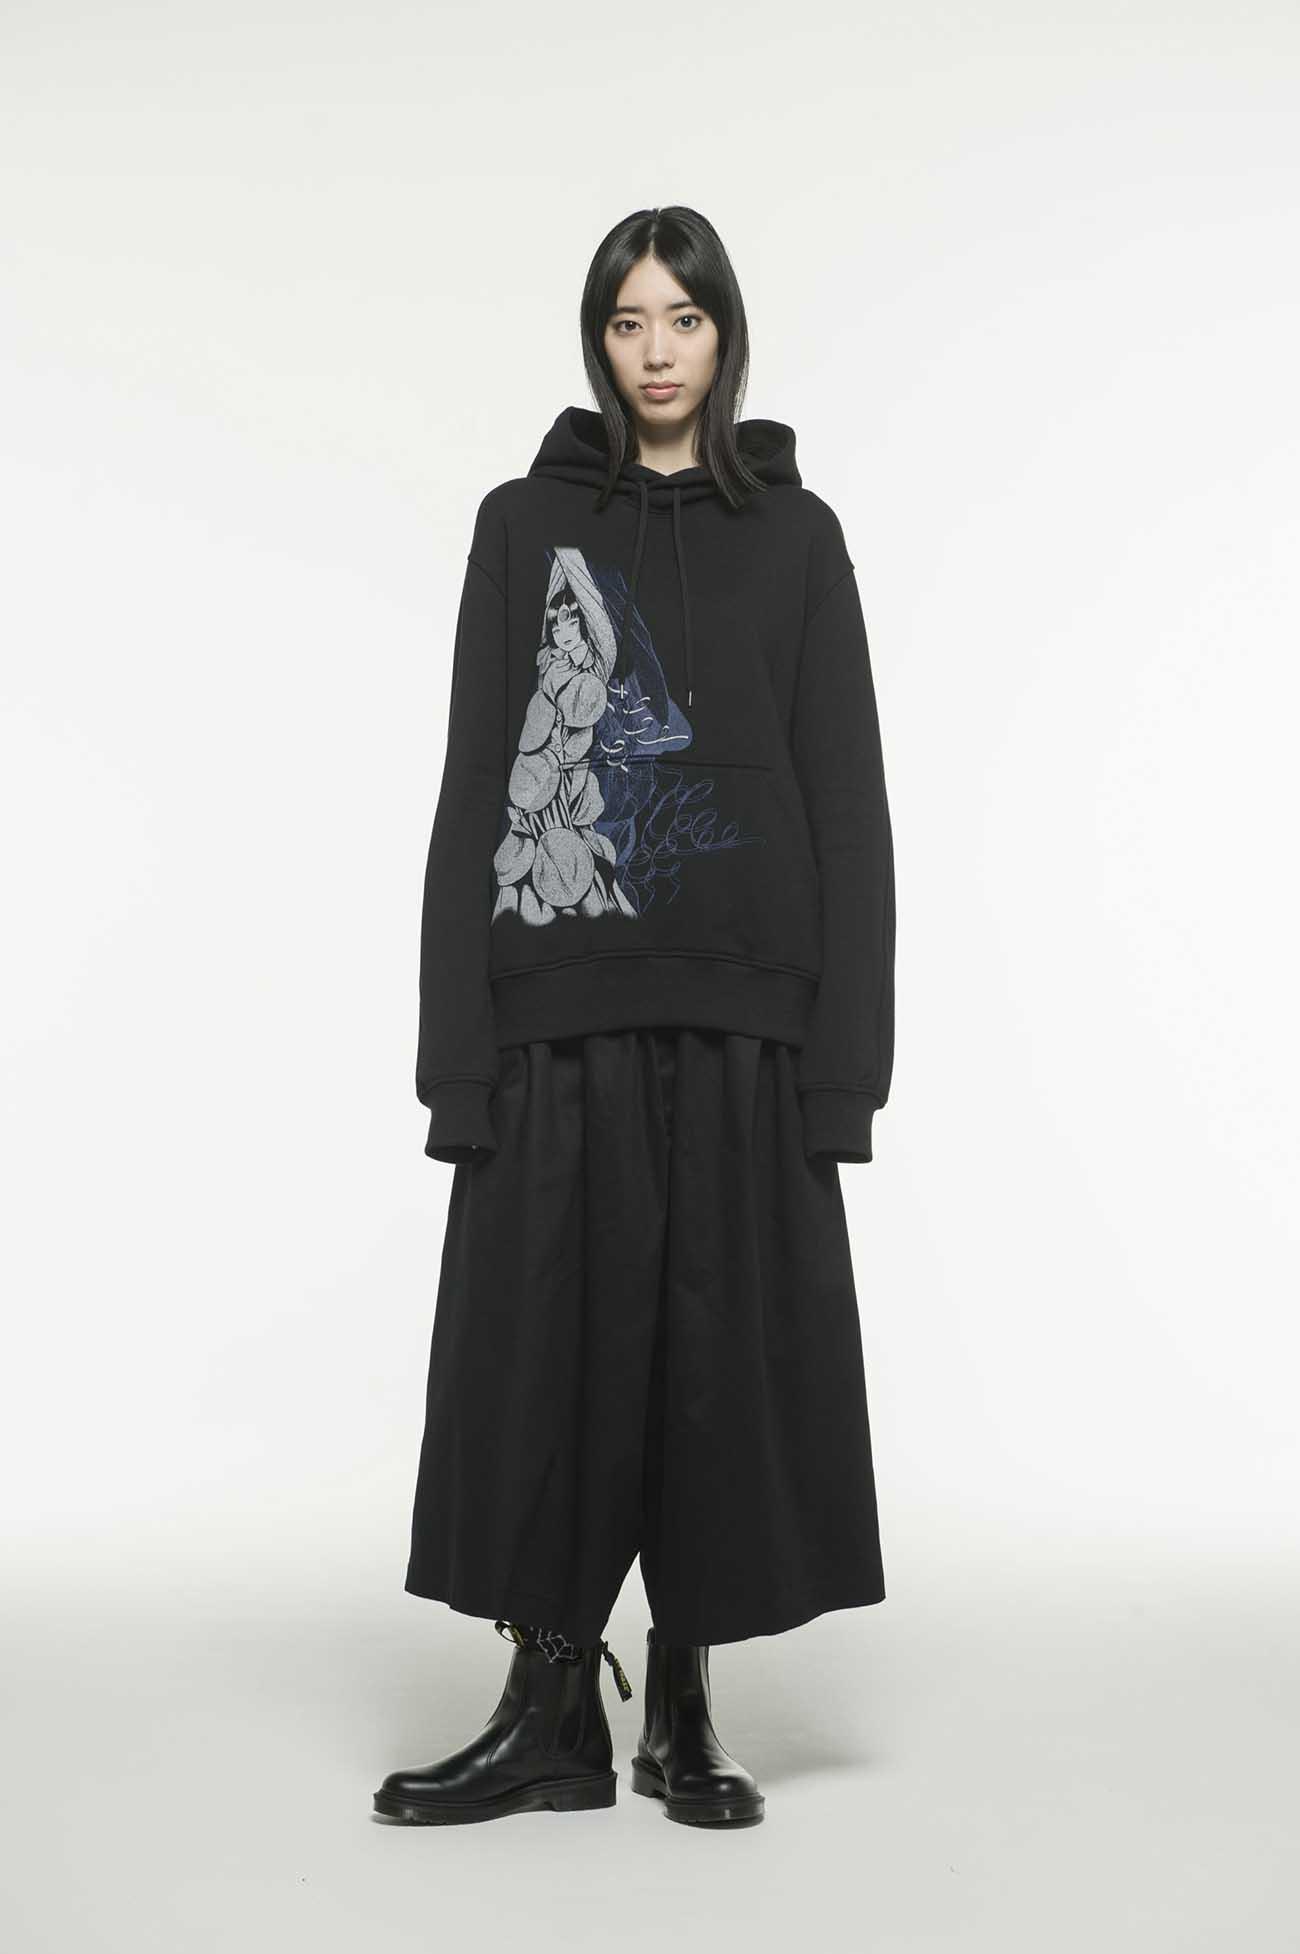 French Terry Stitch Work Azami Uzumaki Wearing Yohji Yamamoto Hoodie